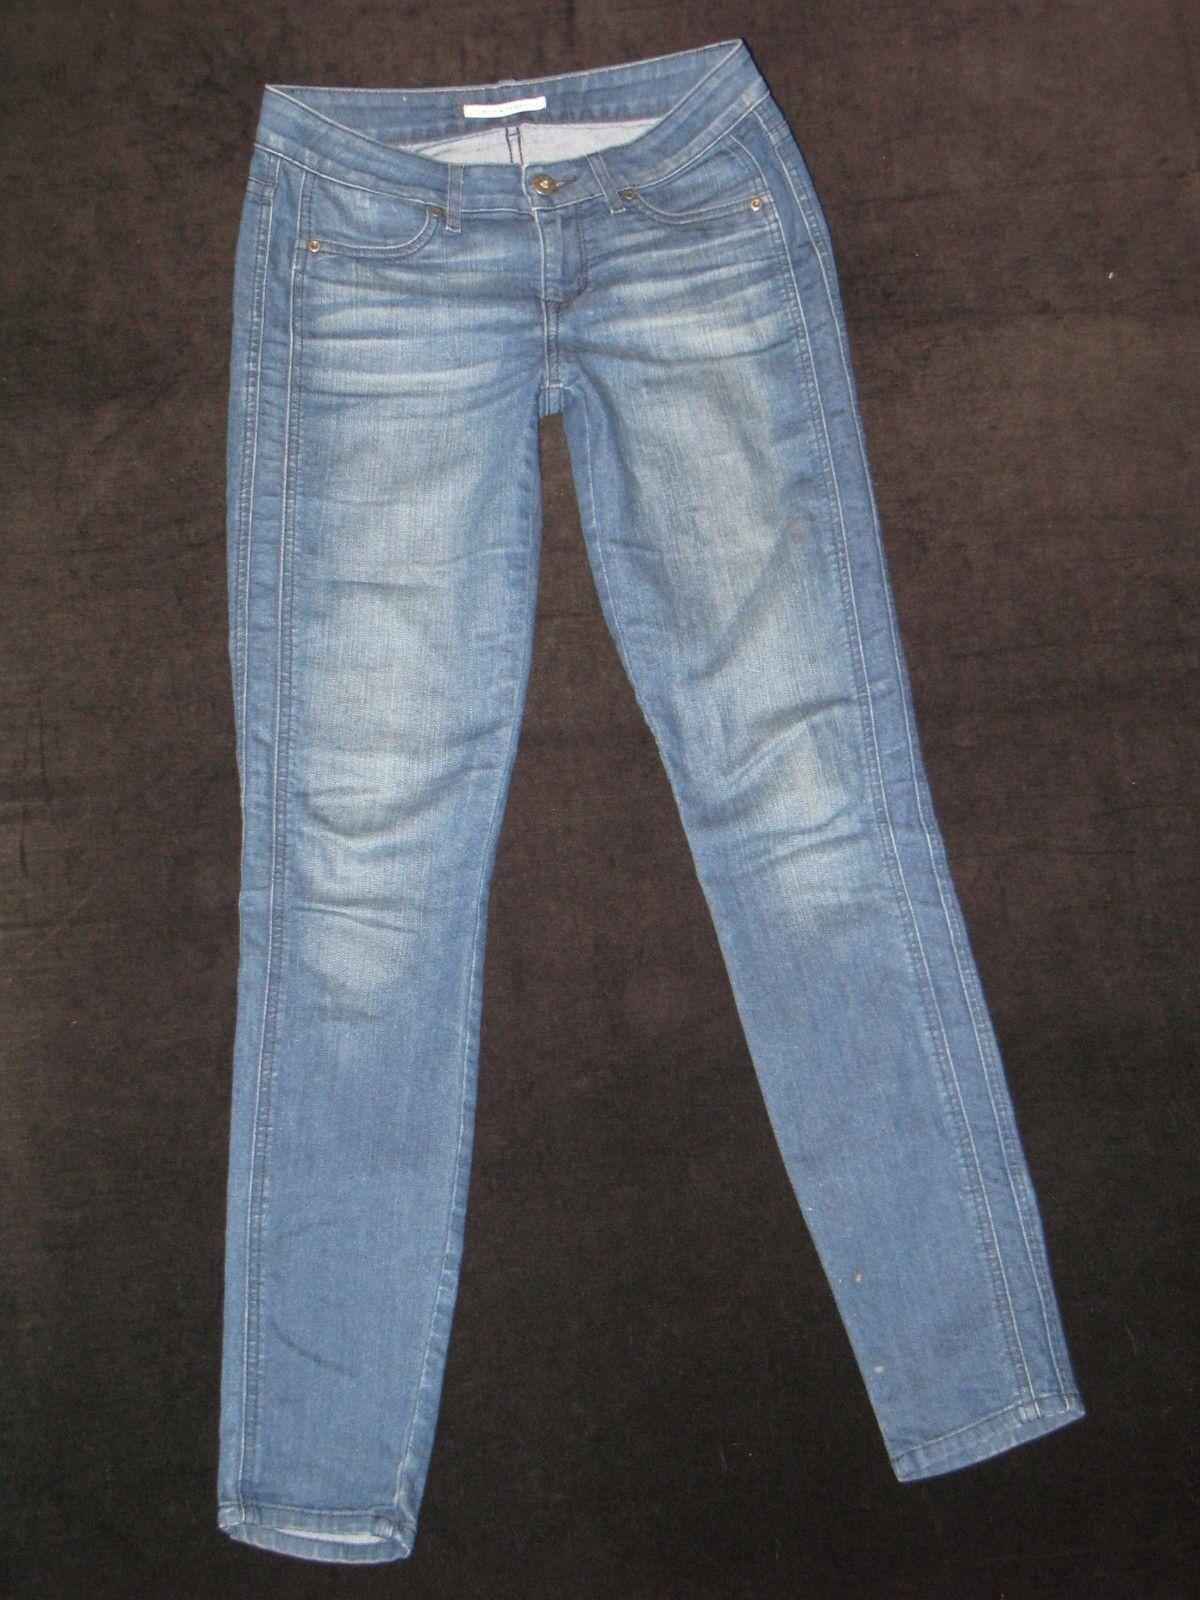 Rich & Skinny Jeans Mid Waist Super Skinny & Stretchy Distressed Sz 26